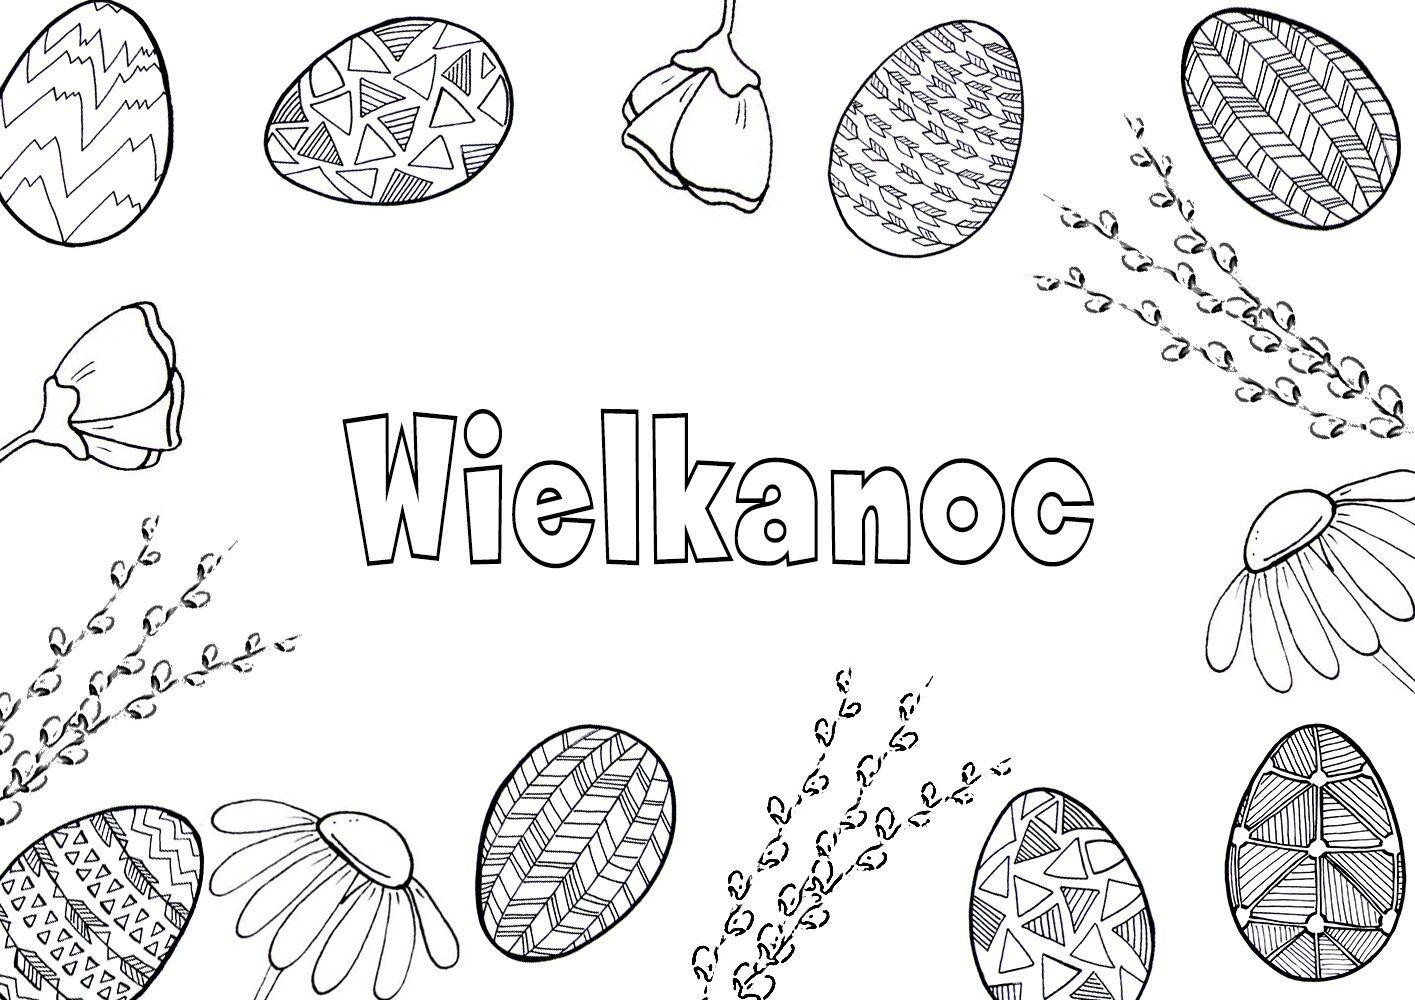 Pin By Marzena Wojczak On Kolorowanki Art Word Search Puzzle Words